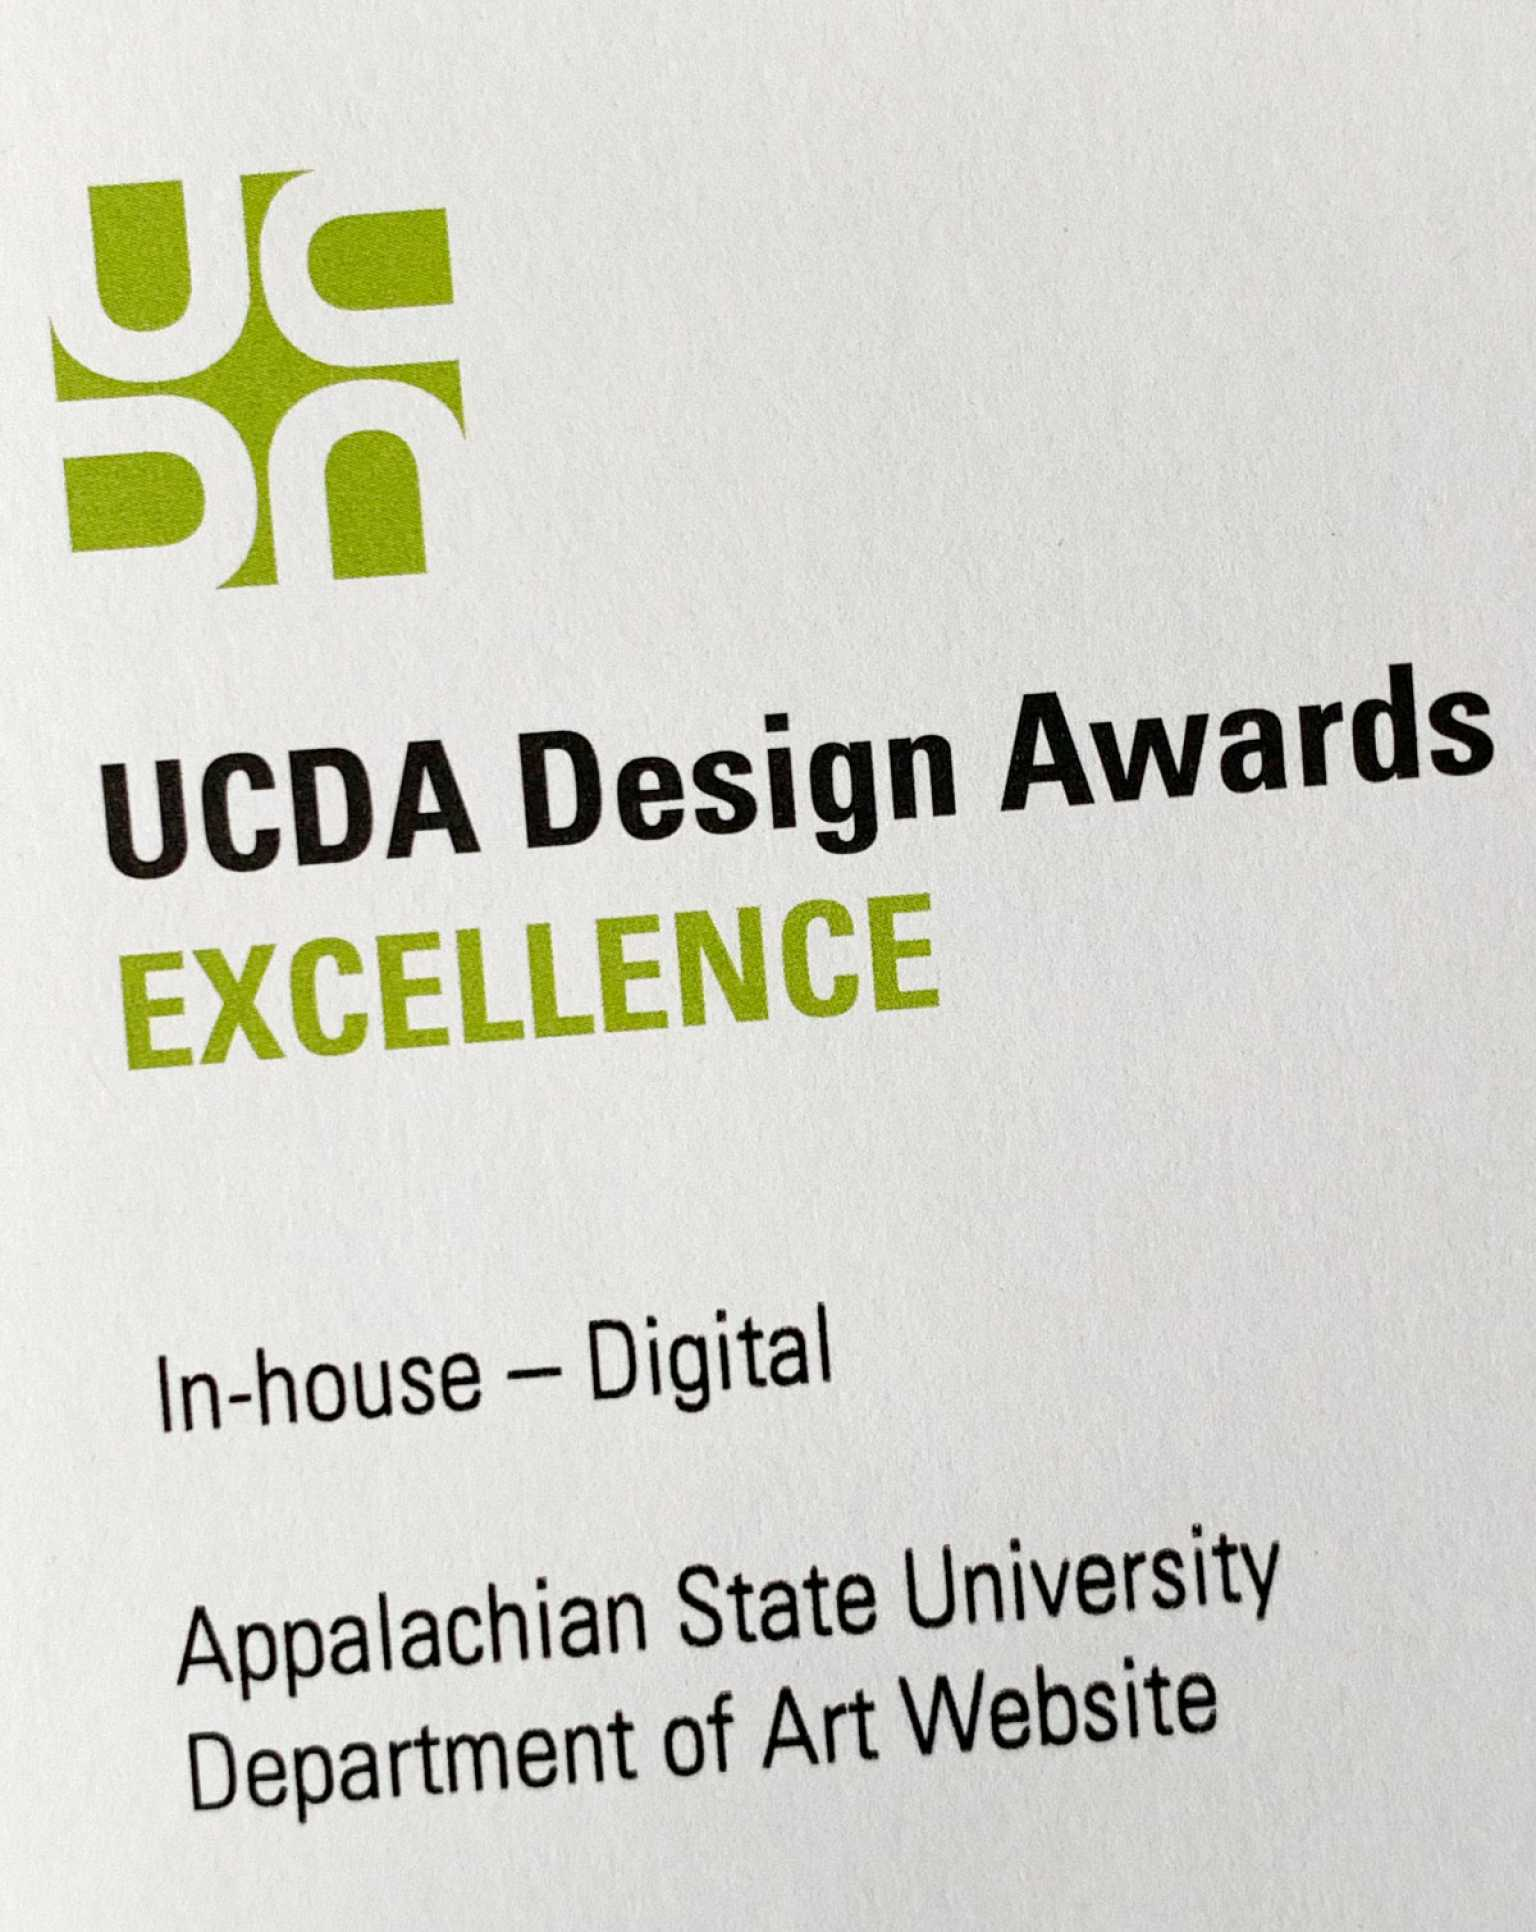 Website award certificate